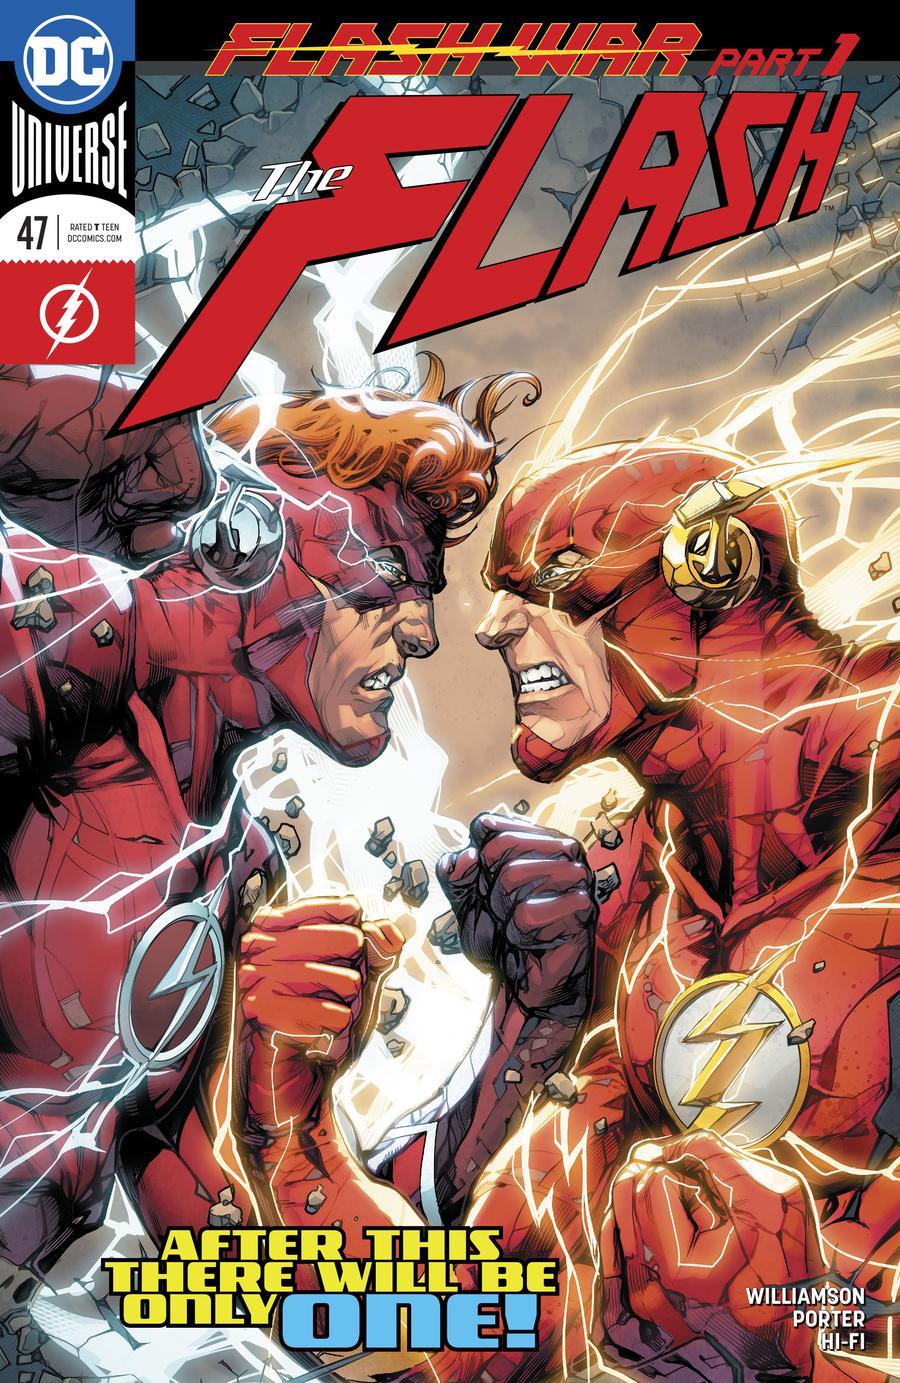 Flash Vol 5 #47 Cover A 1st Ptg Regular Howard Porter Cover